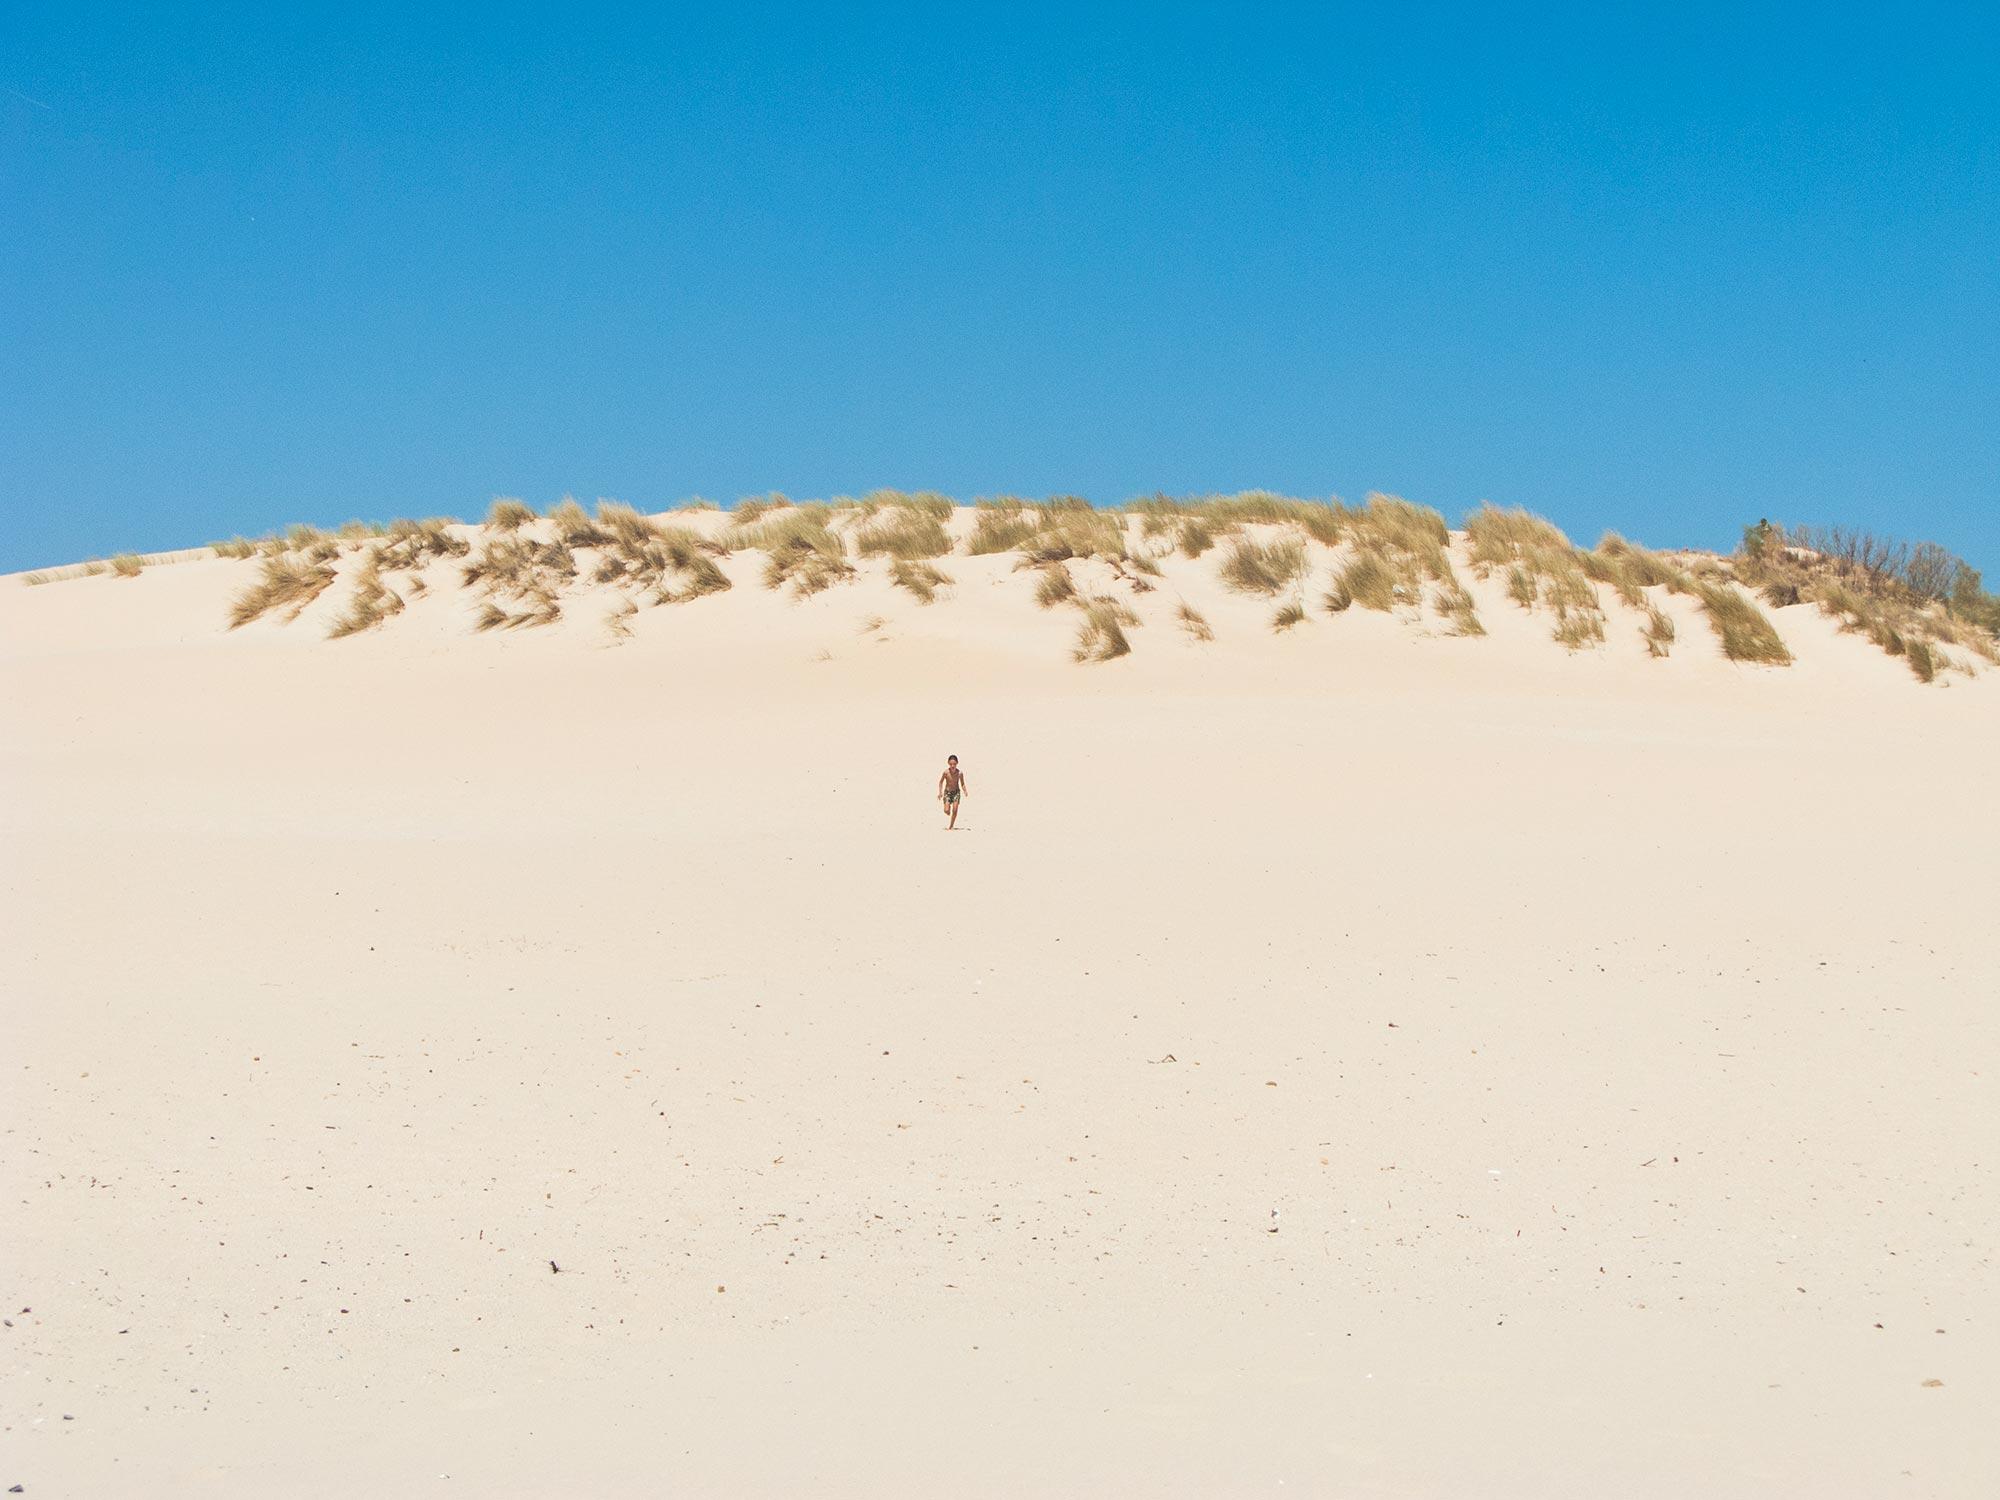 valdevaqueros beach kid running on a dune